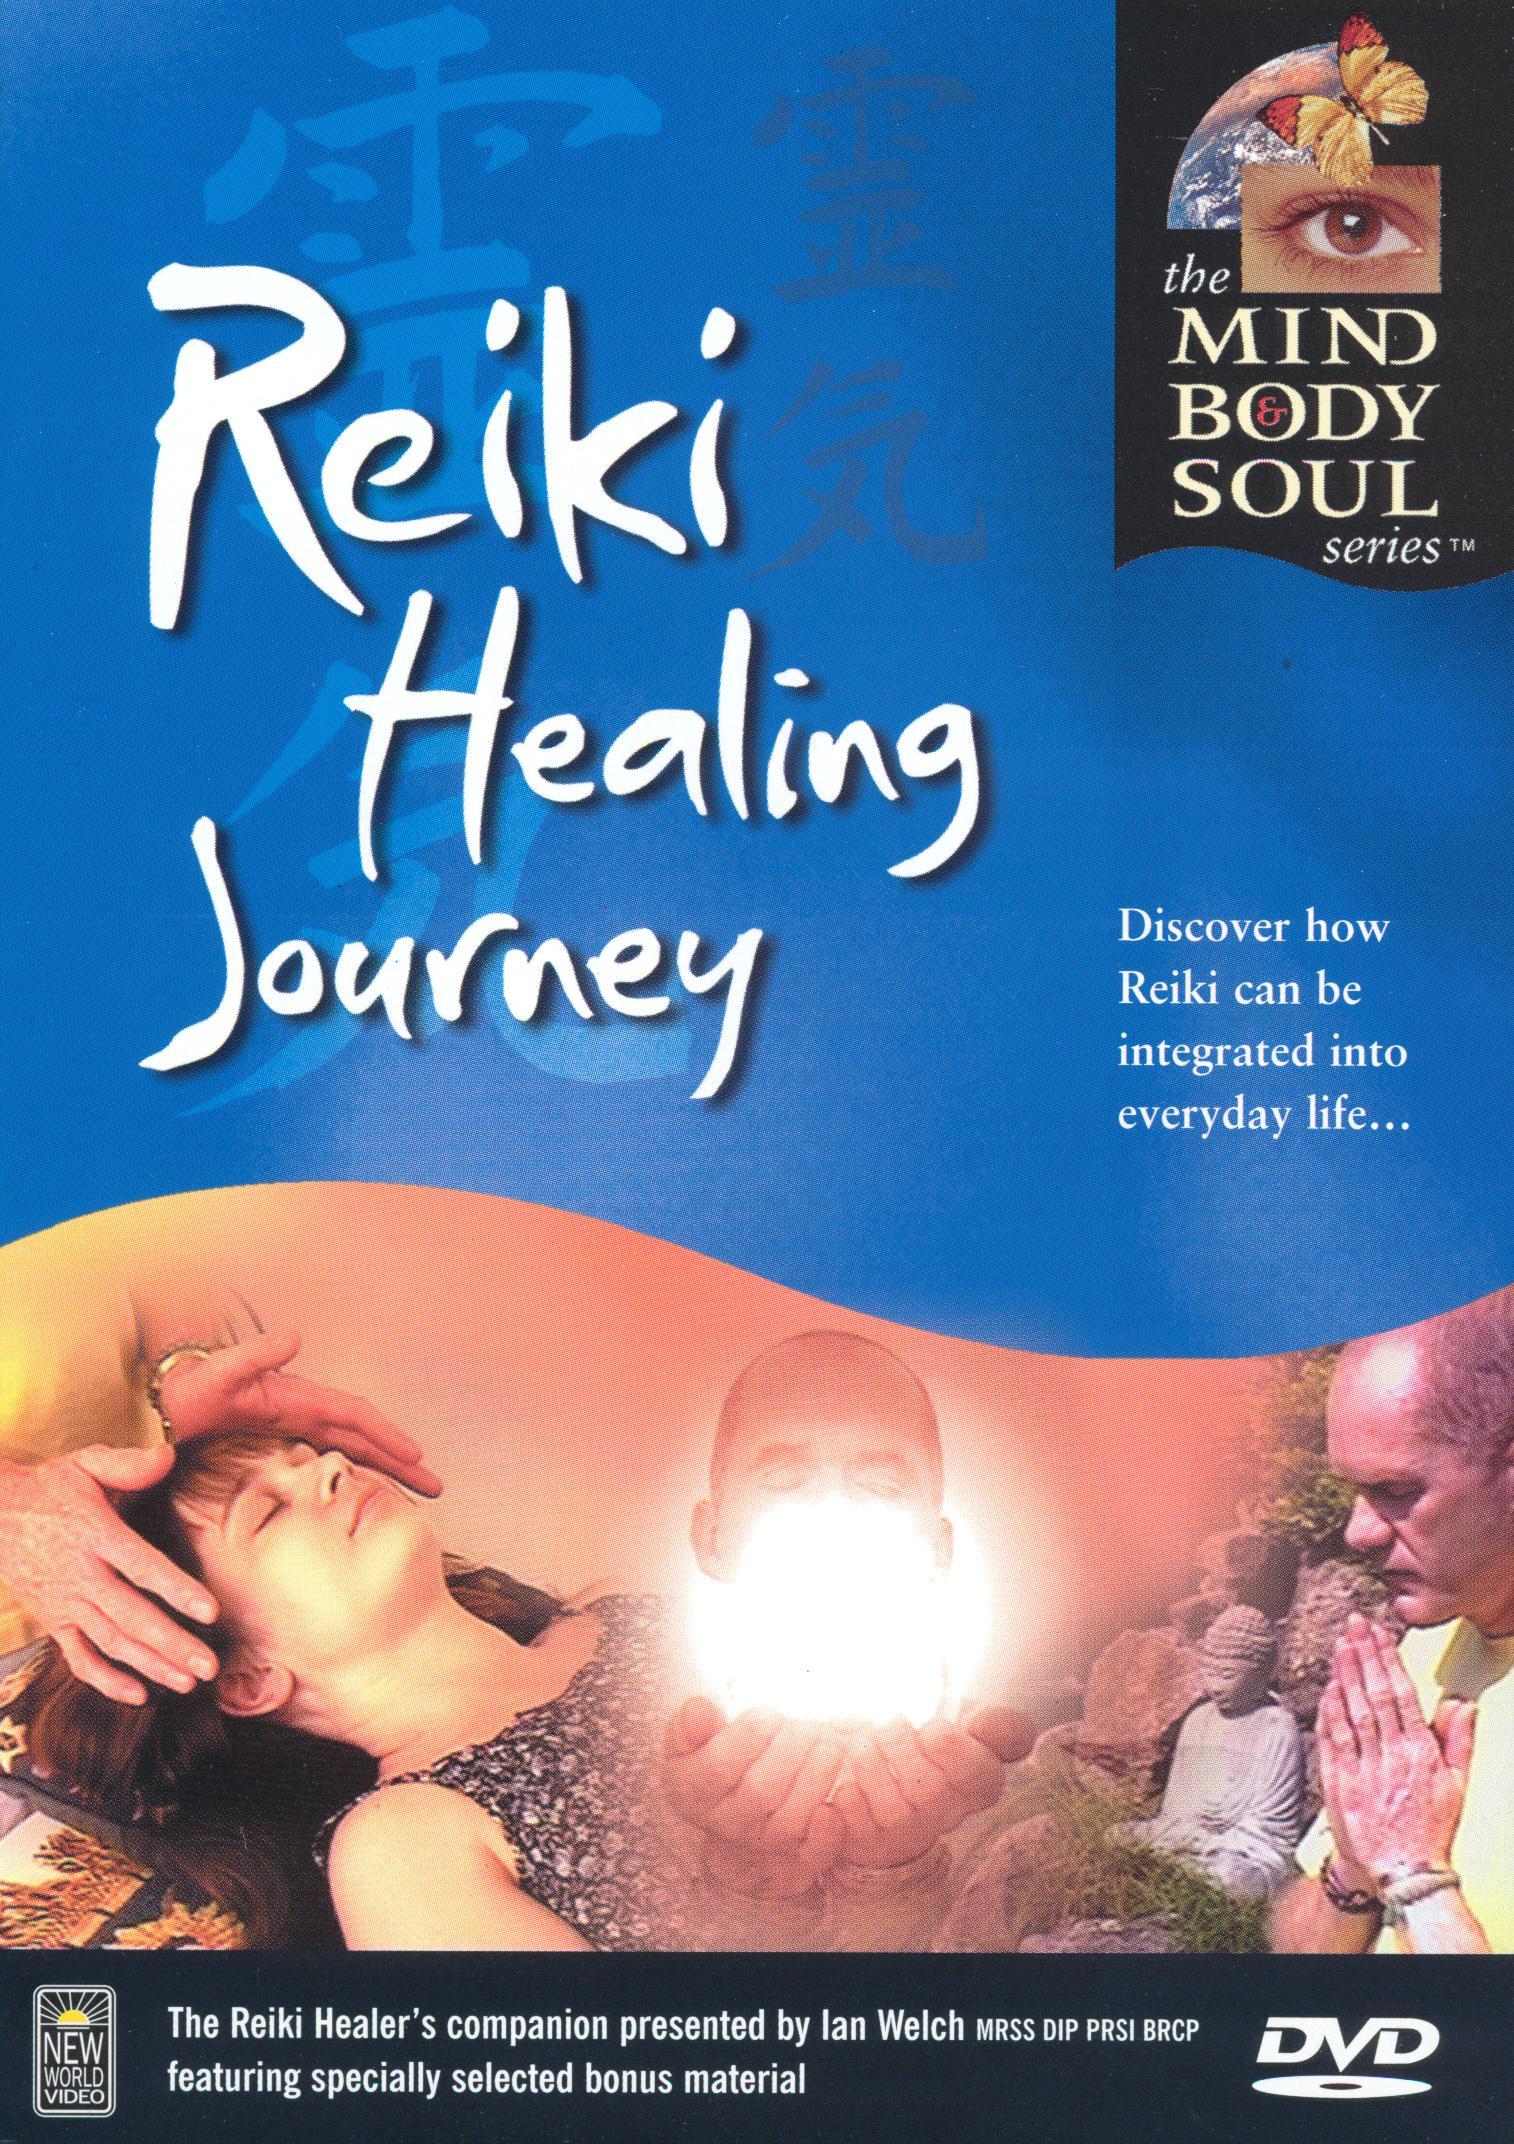 Ian Welch: Reiki Healing Journey